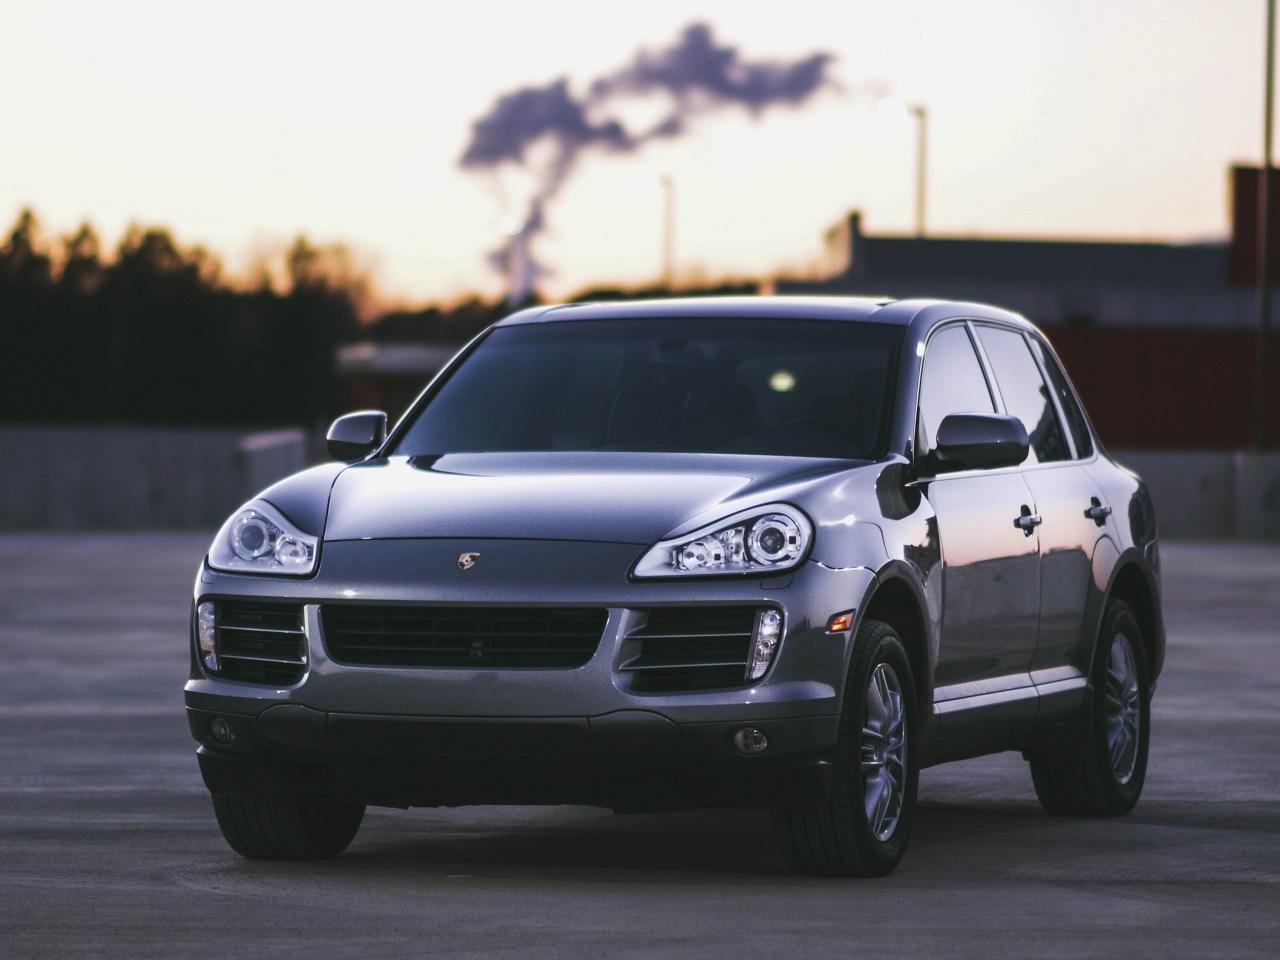 porshe-samochod-suv-auto